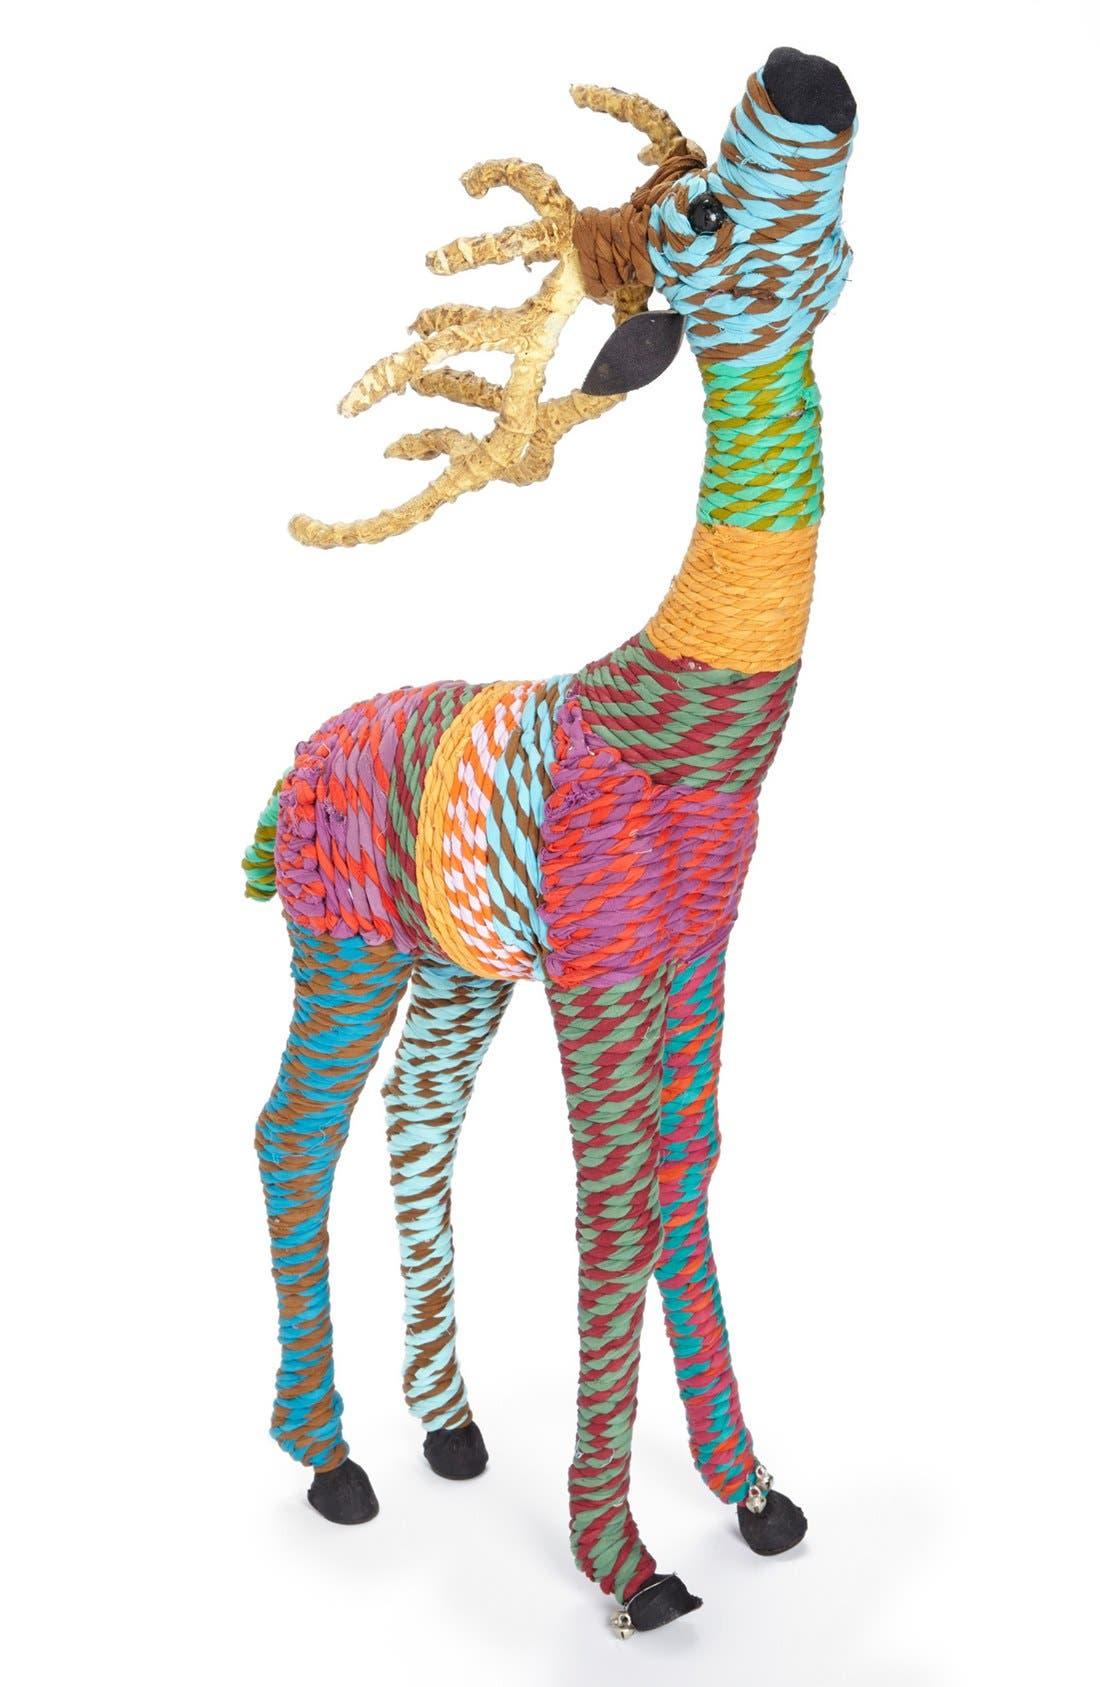 Main Image - Shiraleah Chindi Reindeer Decoration, Small